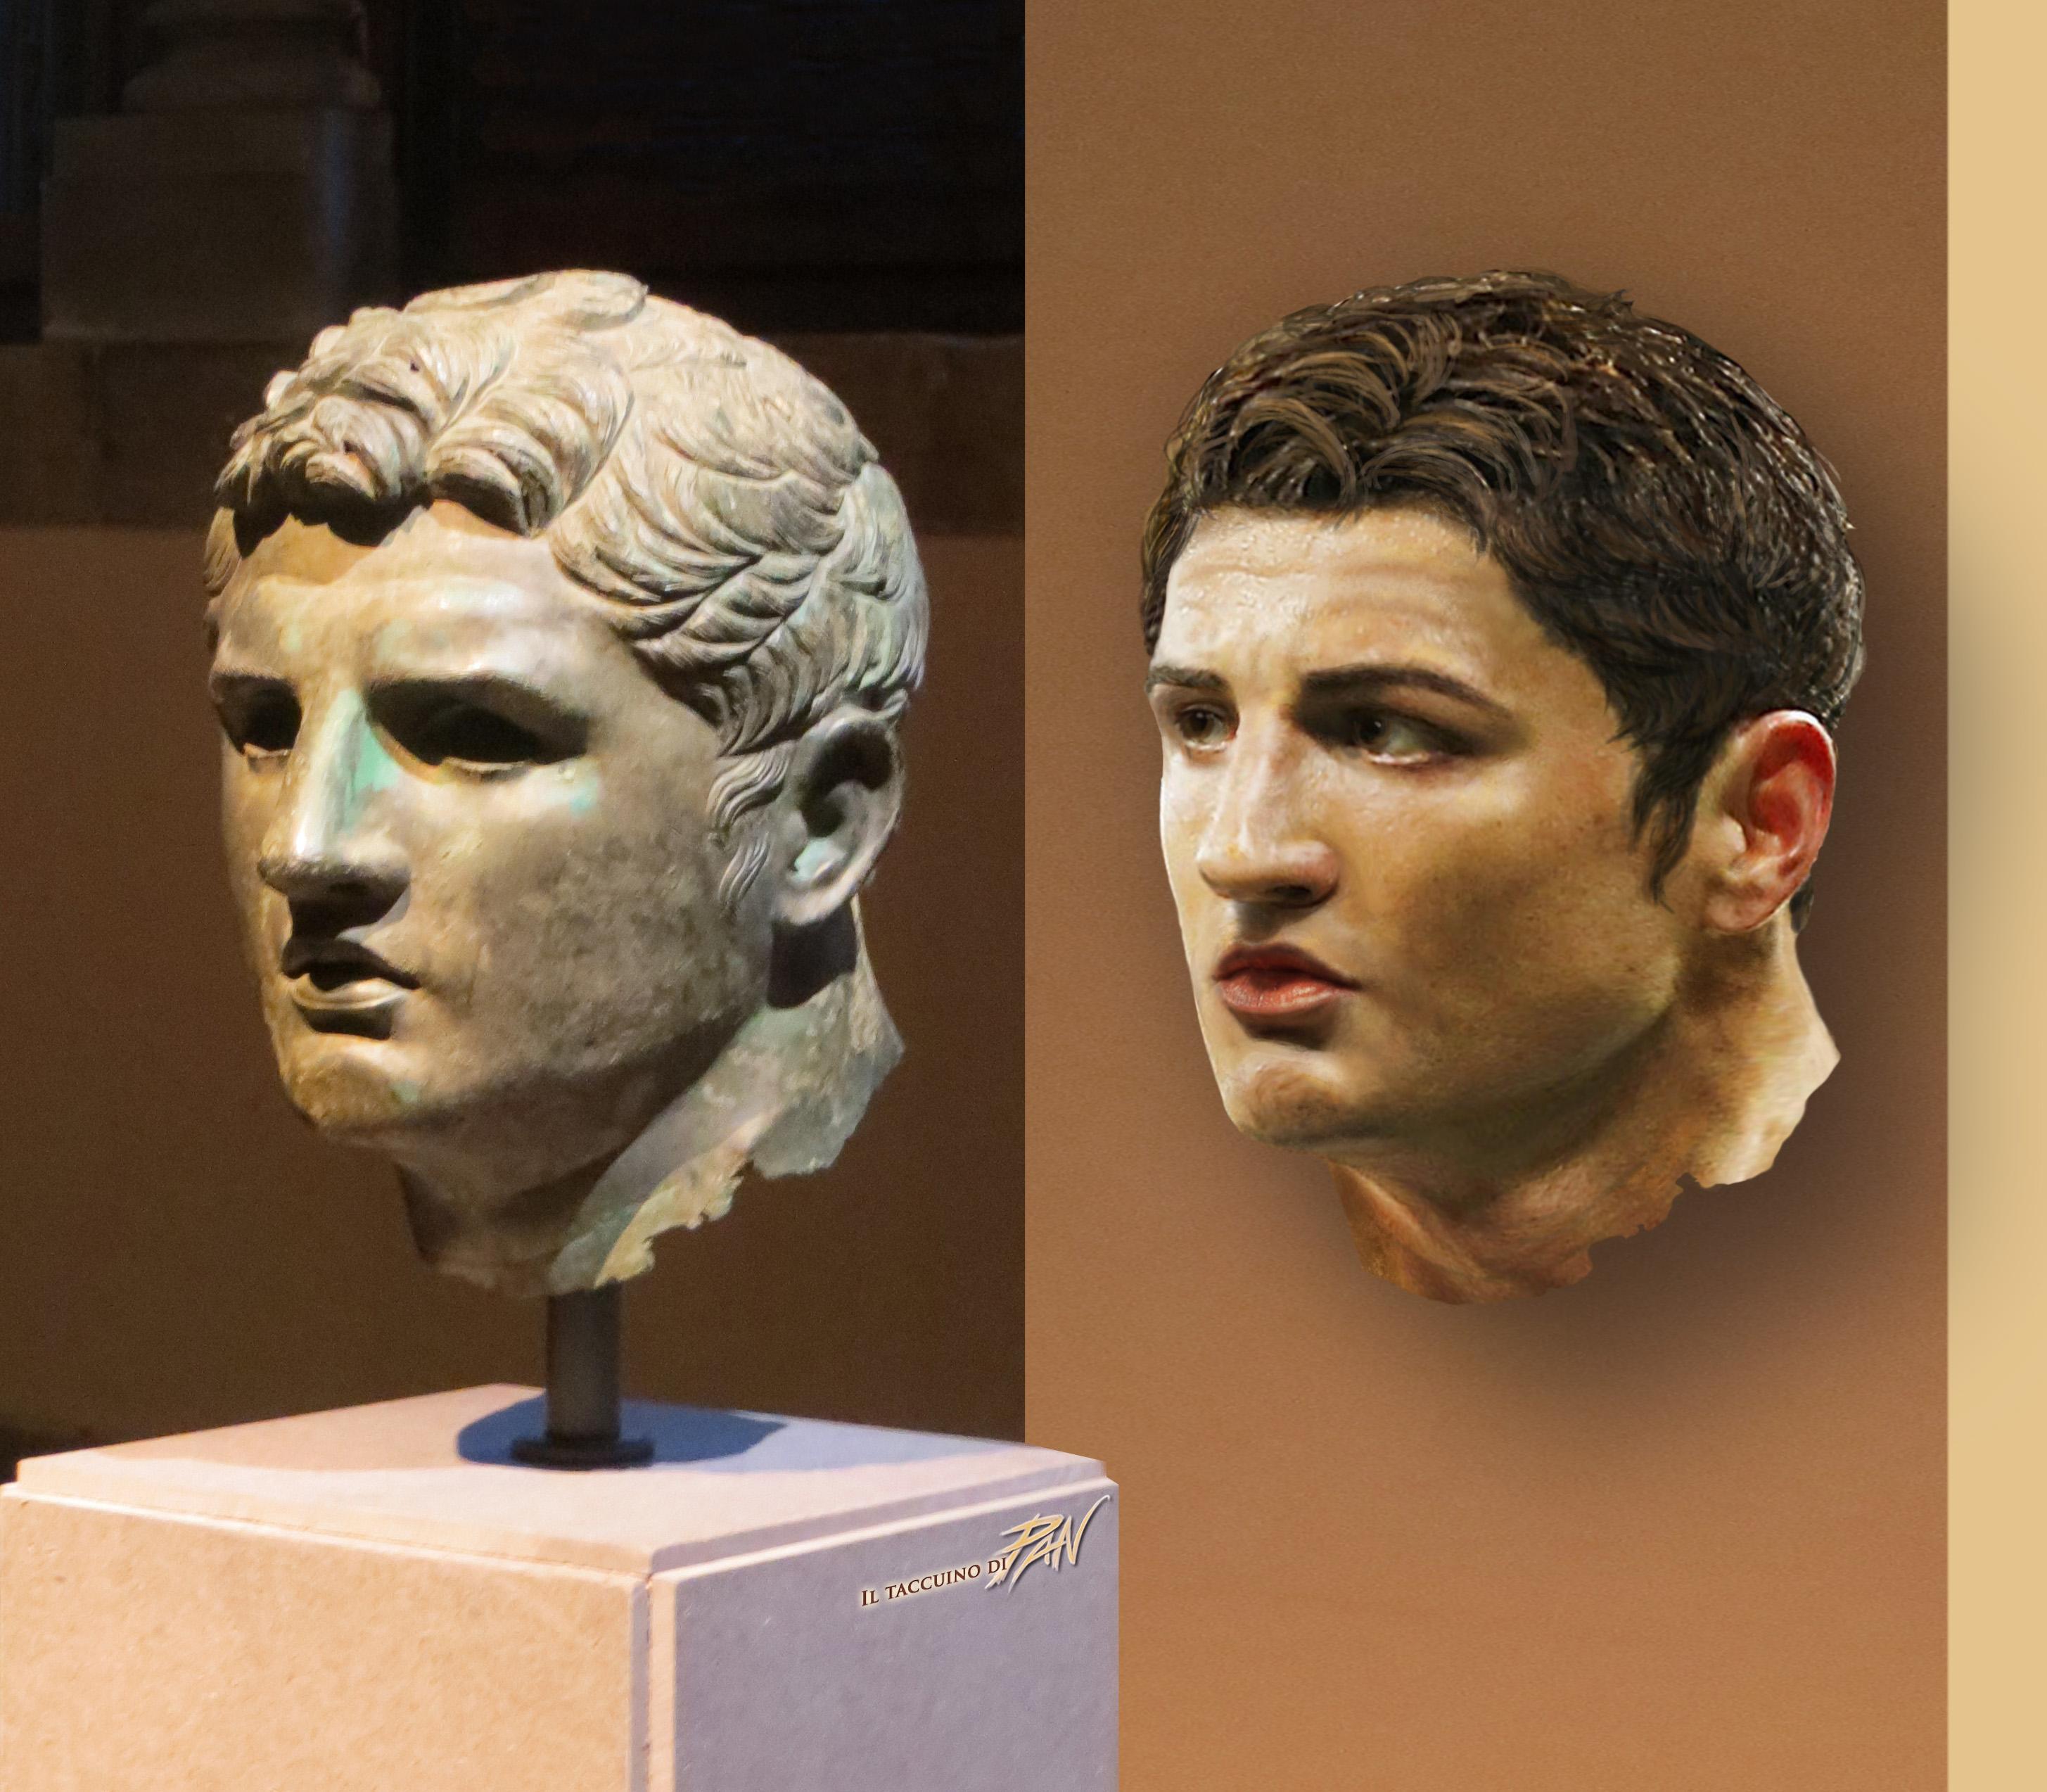 Atleti di Bronzo (ricostruzione digitale) by Panaiotis